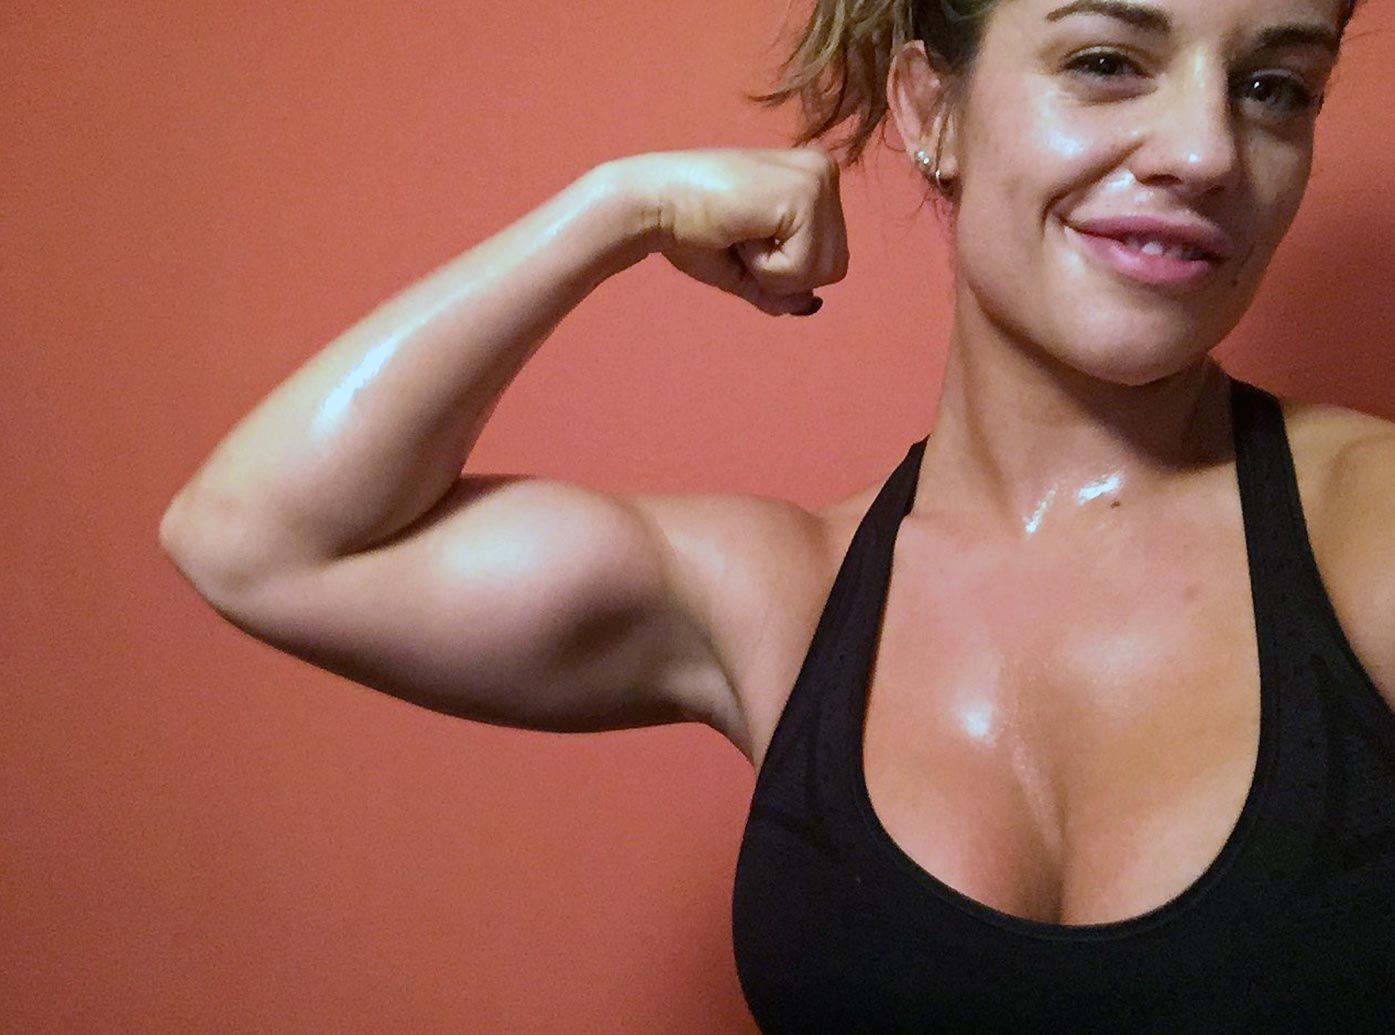 Celeste Bonin Nude Leaked The Fappening & Sexy 0266